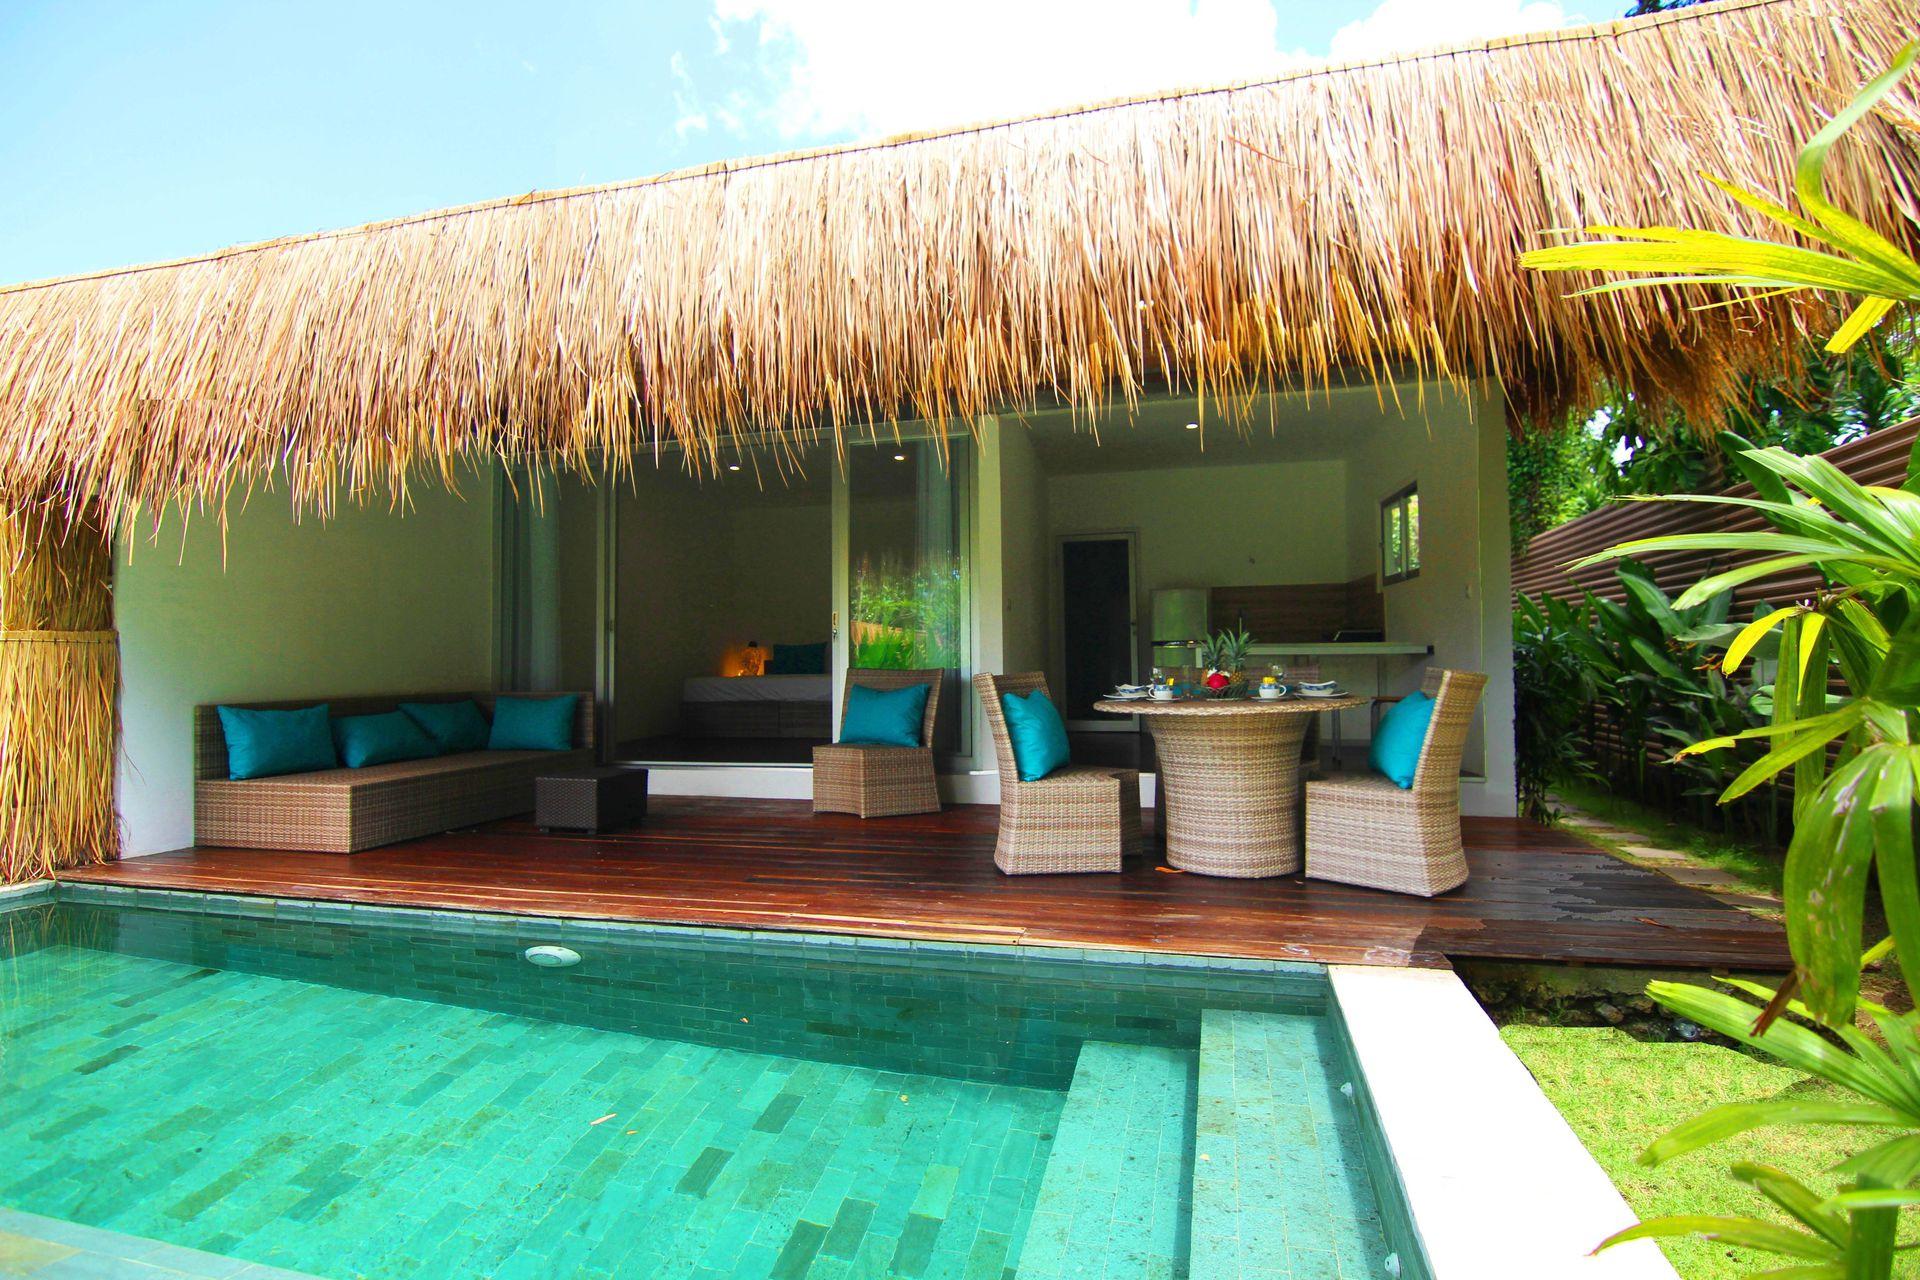 Tropical Suite Villa in Canggu Bali island